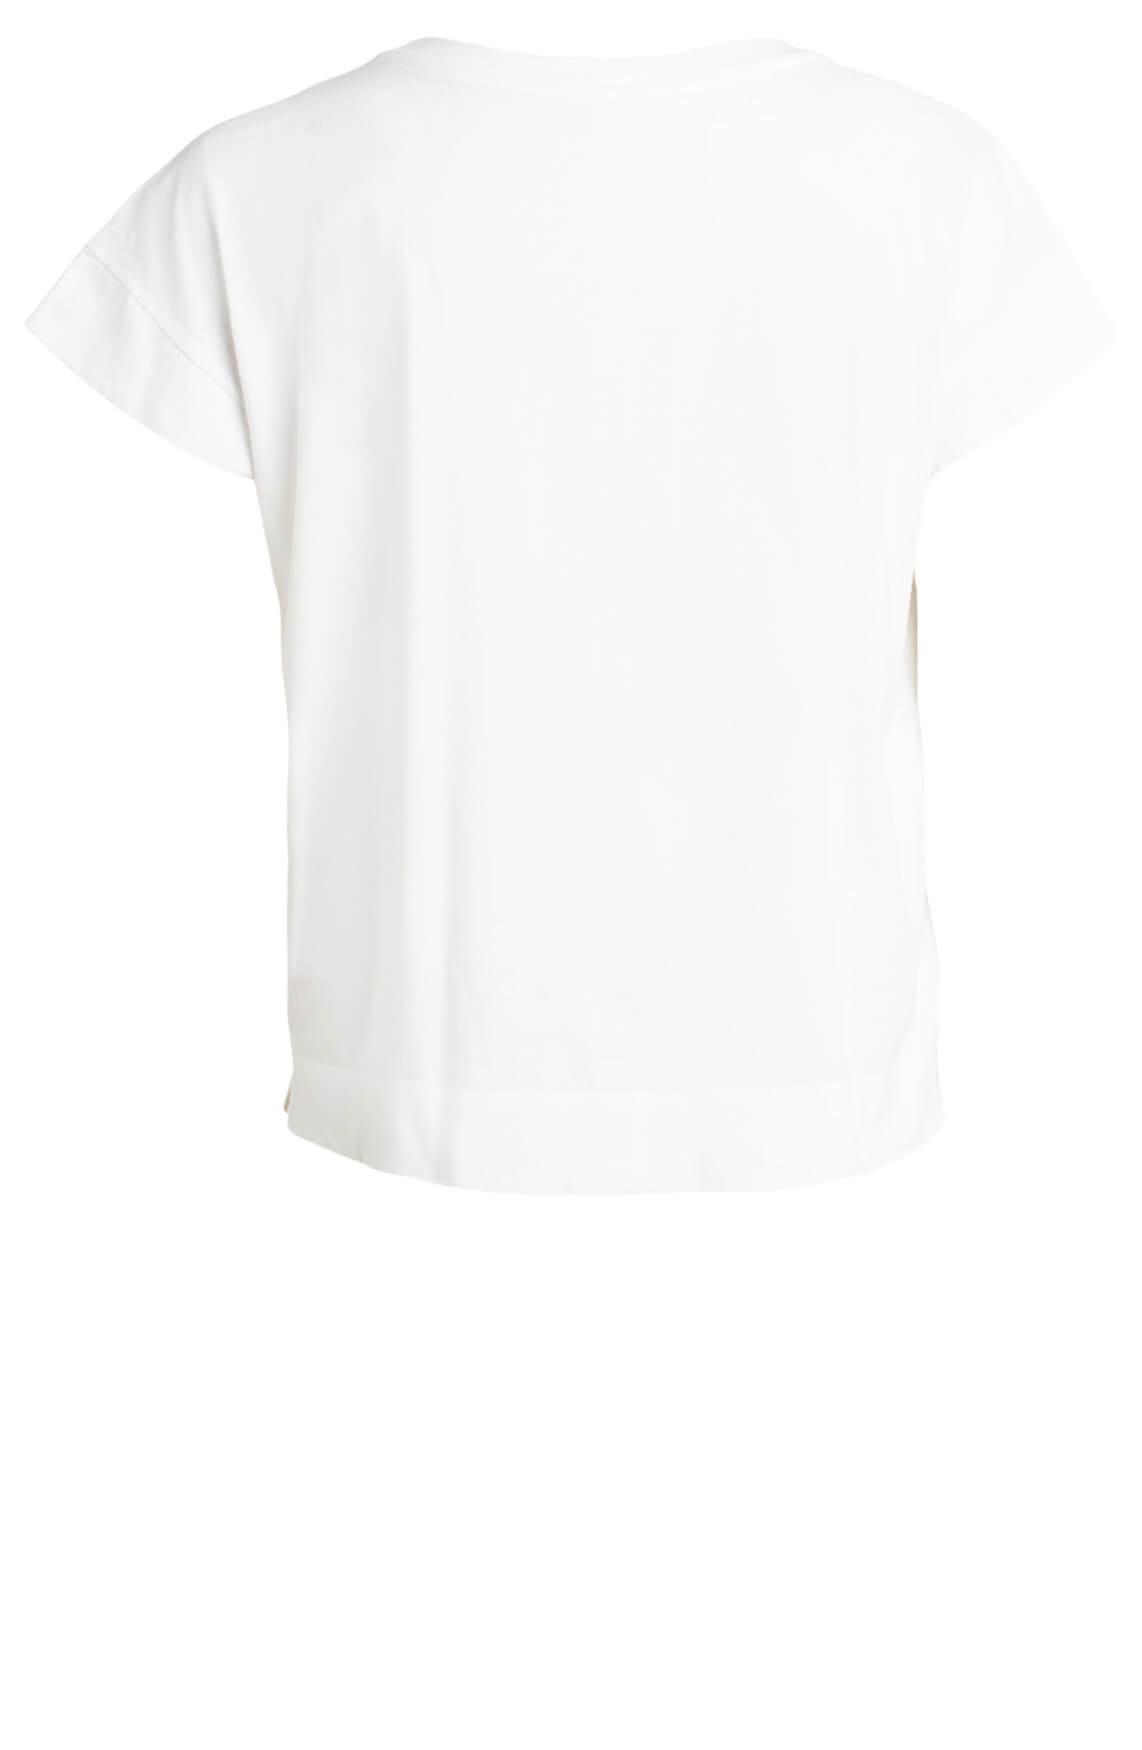 Marccain Sports Dames Shirt met pailletten wit